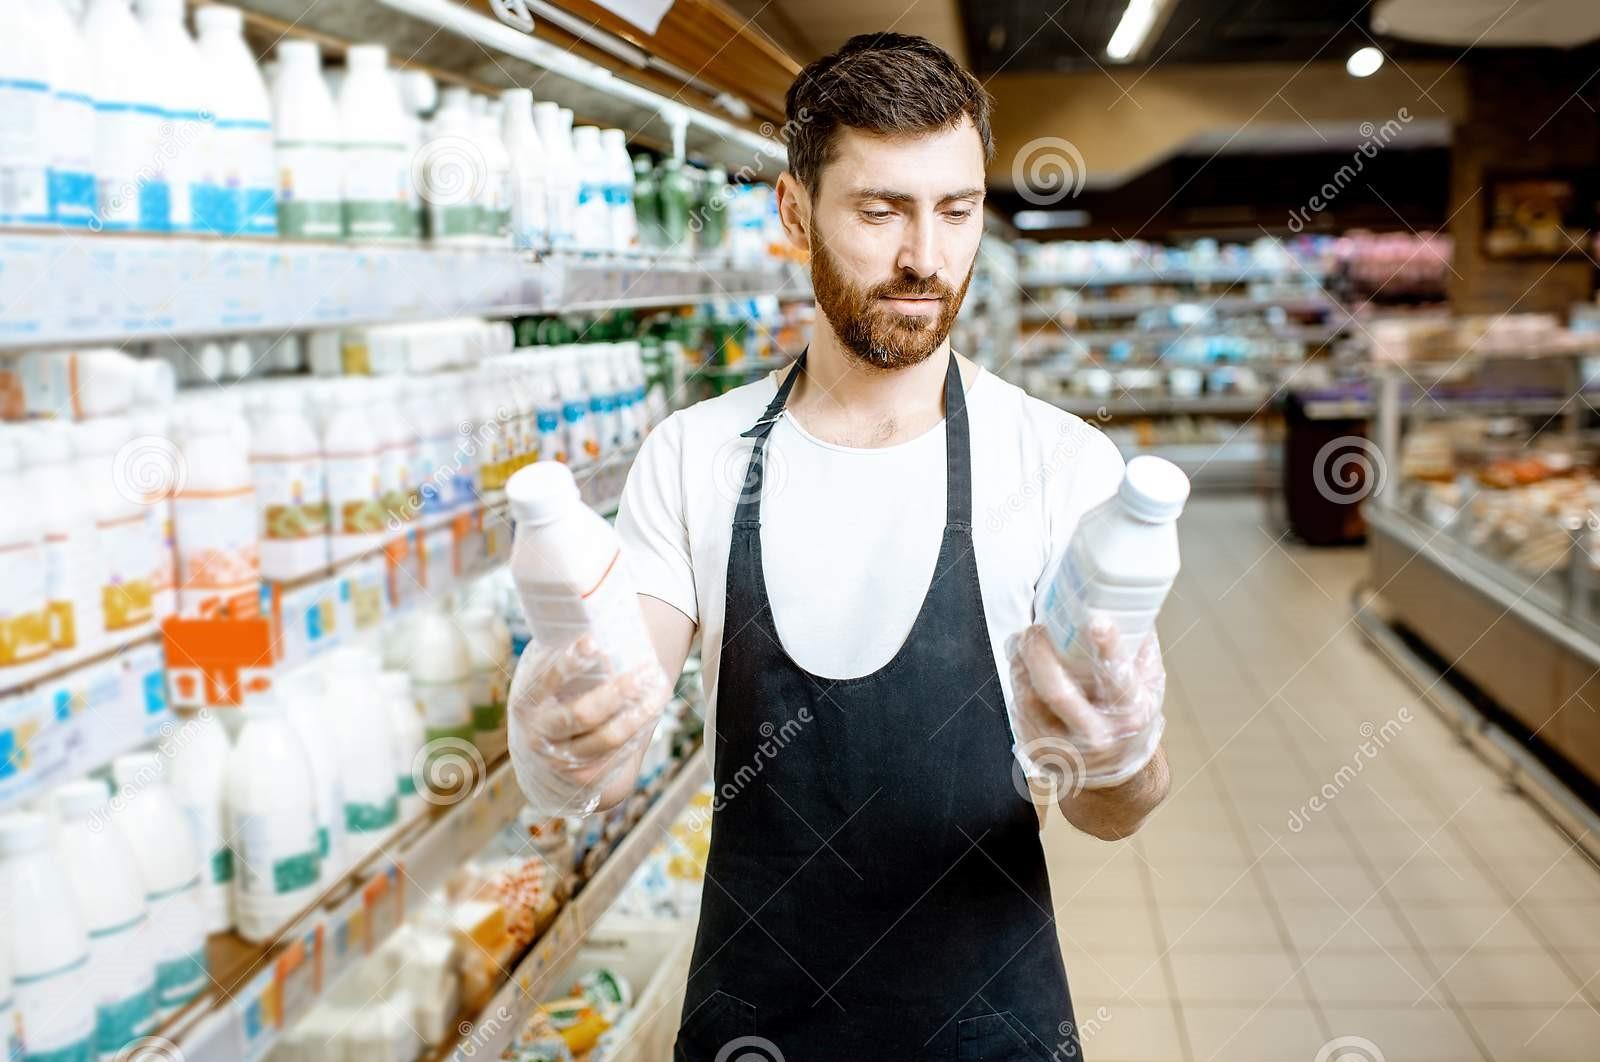 Dairy products Sales Executive تنفيذي مبيعات في سوبر ماركت